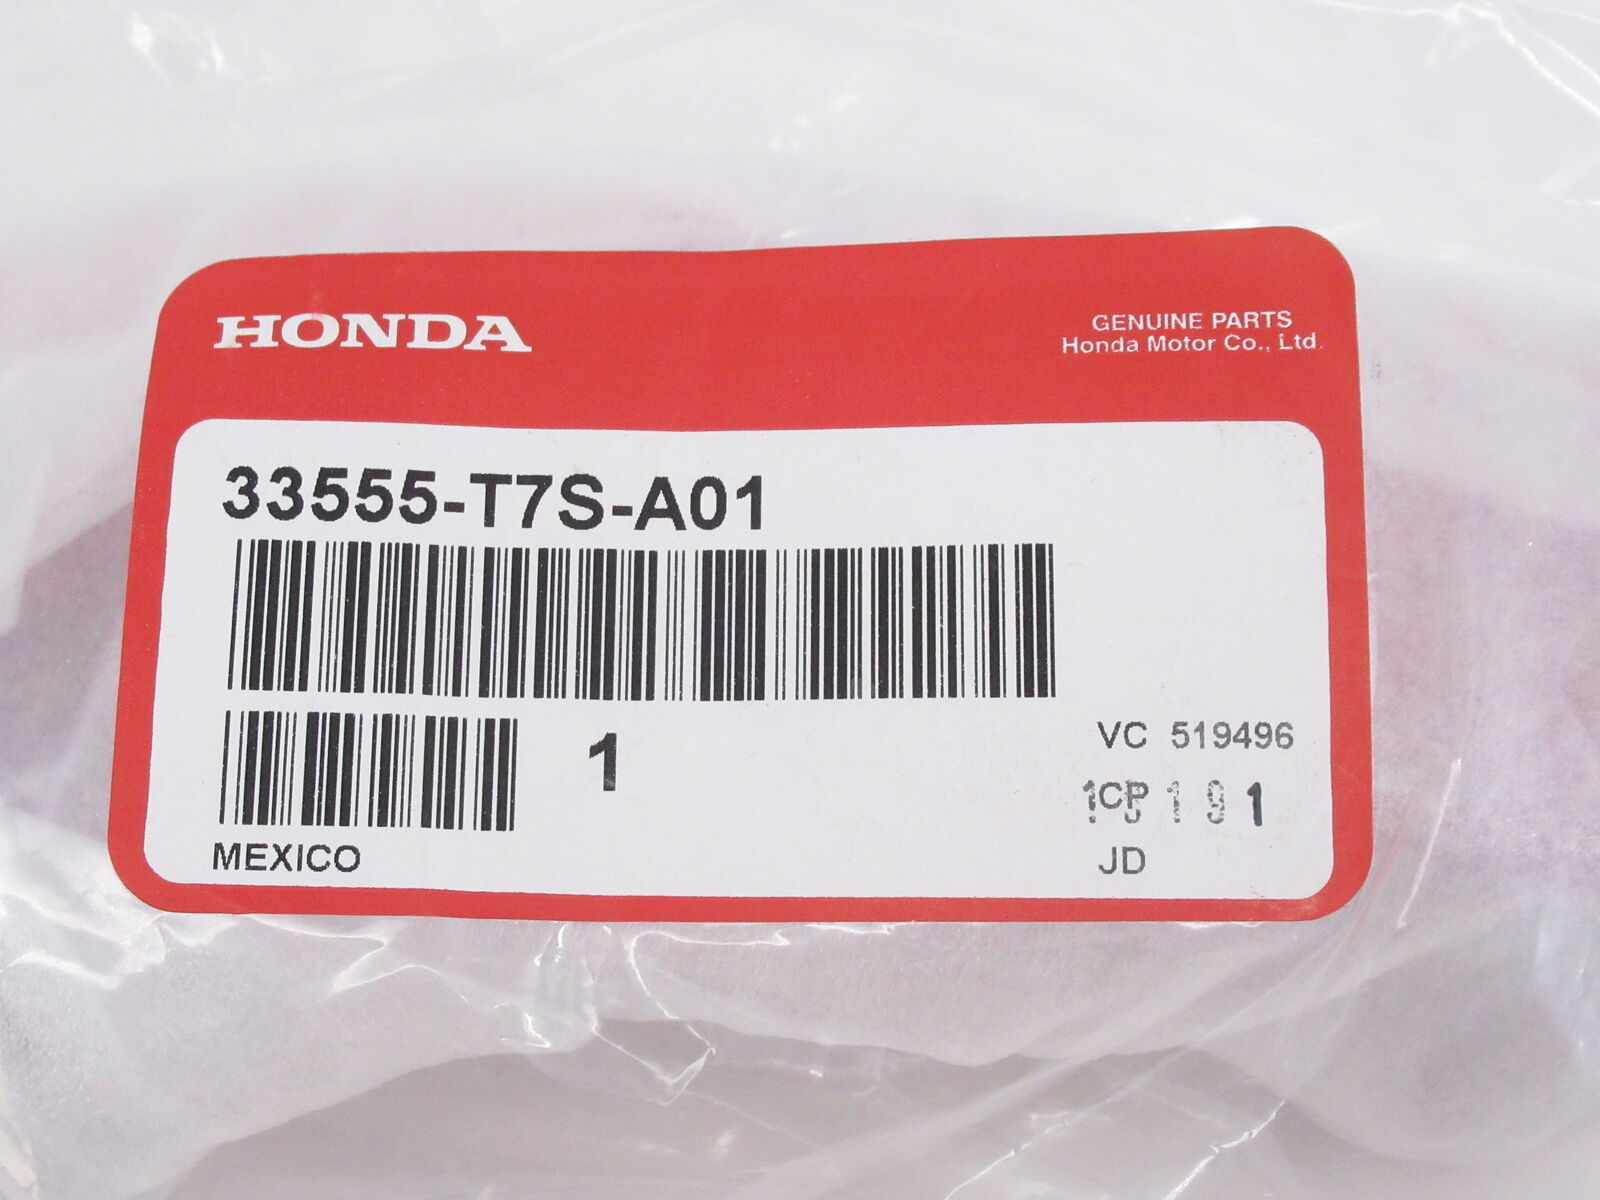 Genuine Honda Reflector Assembly L Rear 33555-T7S-A01